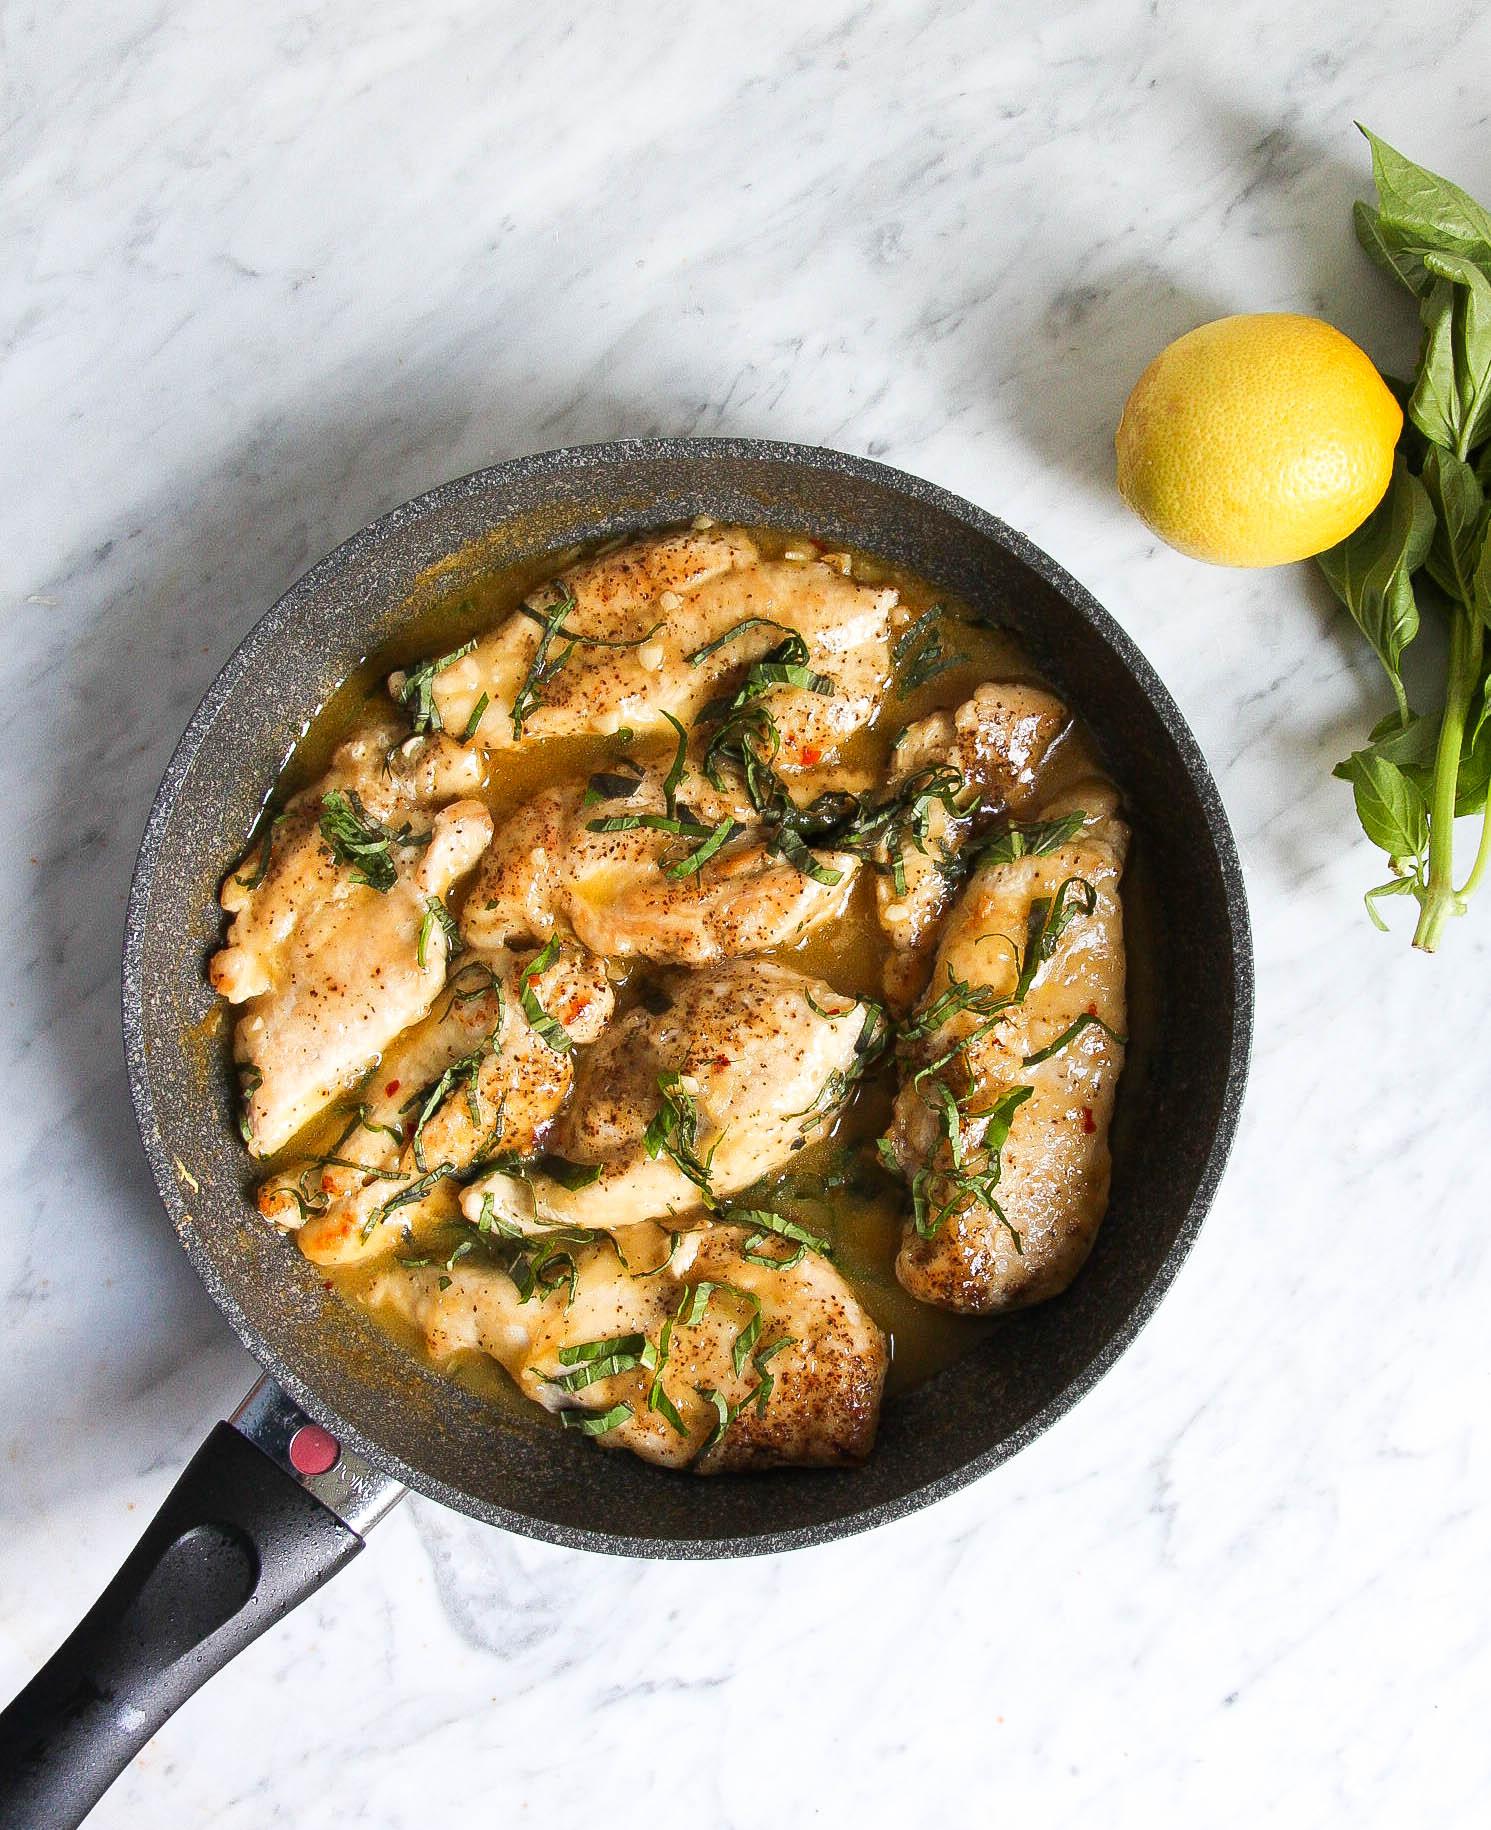 Lemon Basil Chicken Skillet The Defined Dish Recipes